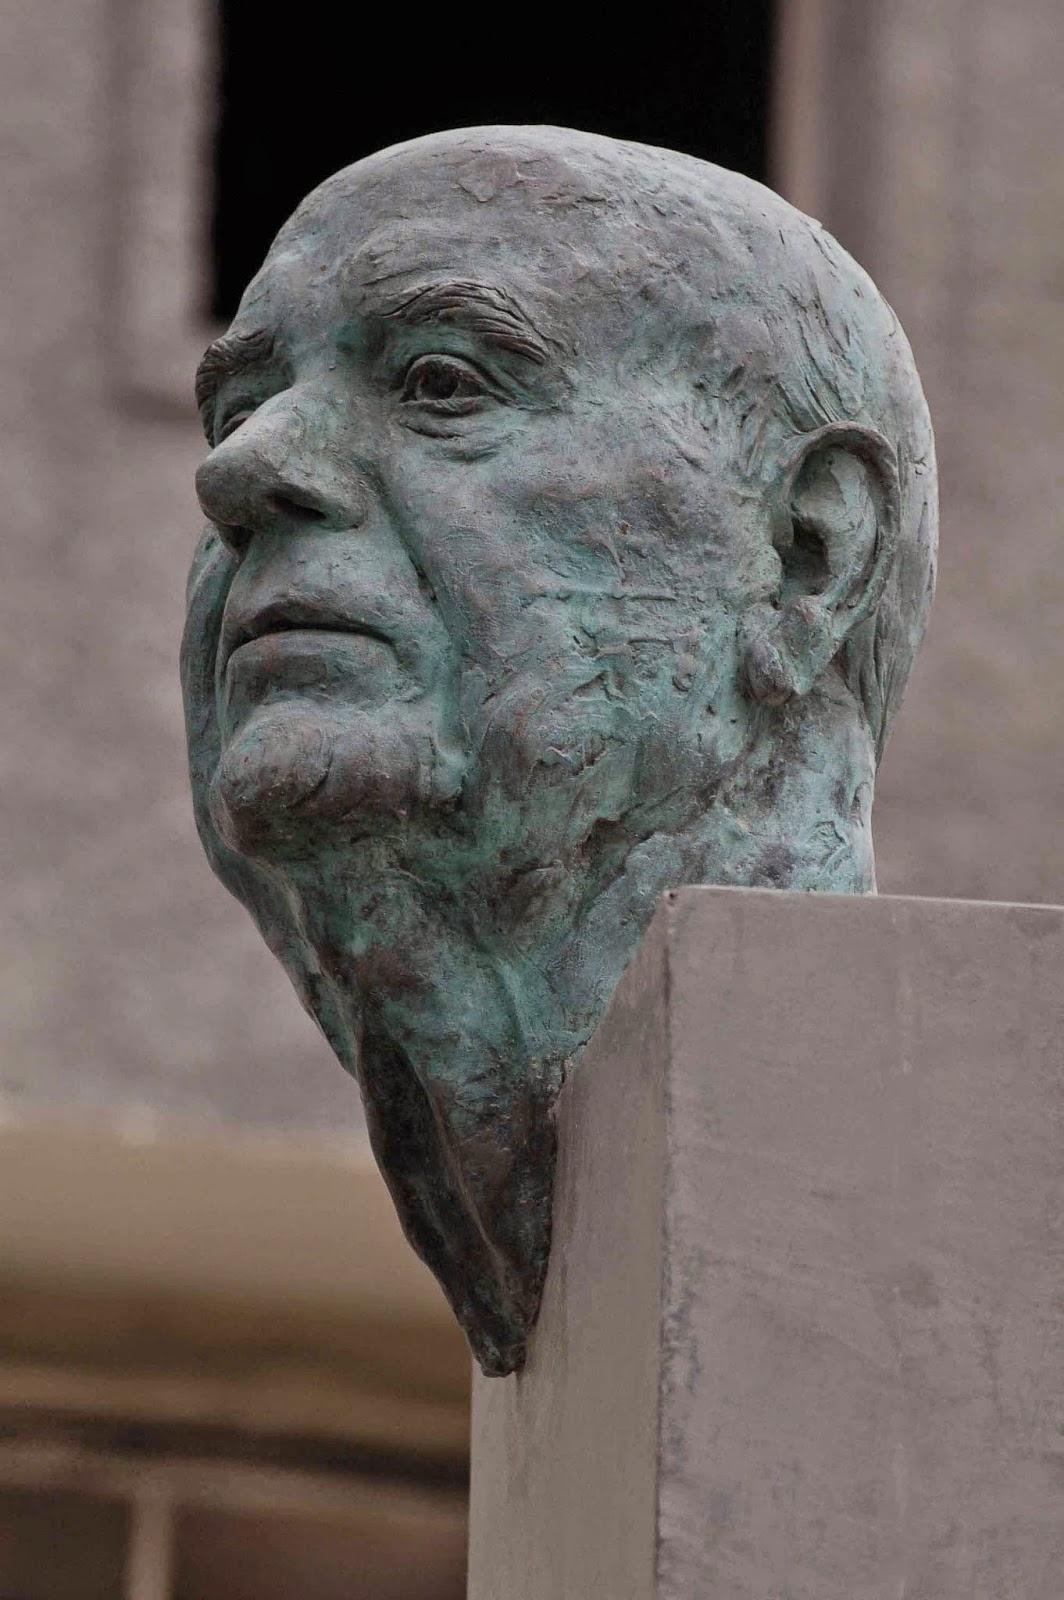 Monumento bronce Fuente Álamo Murcia Arturo Serra escultura 3